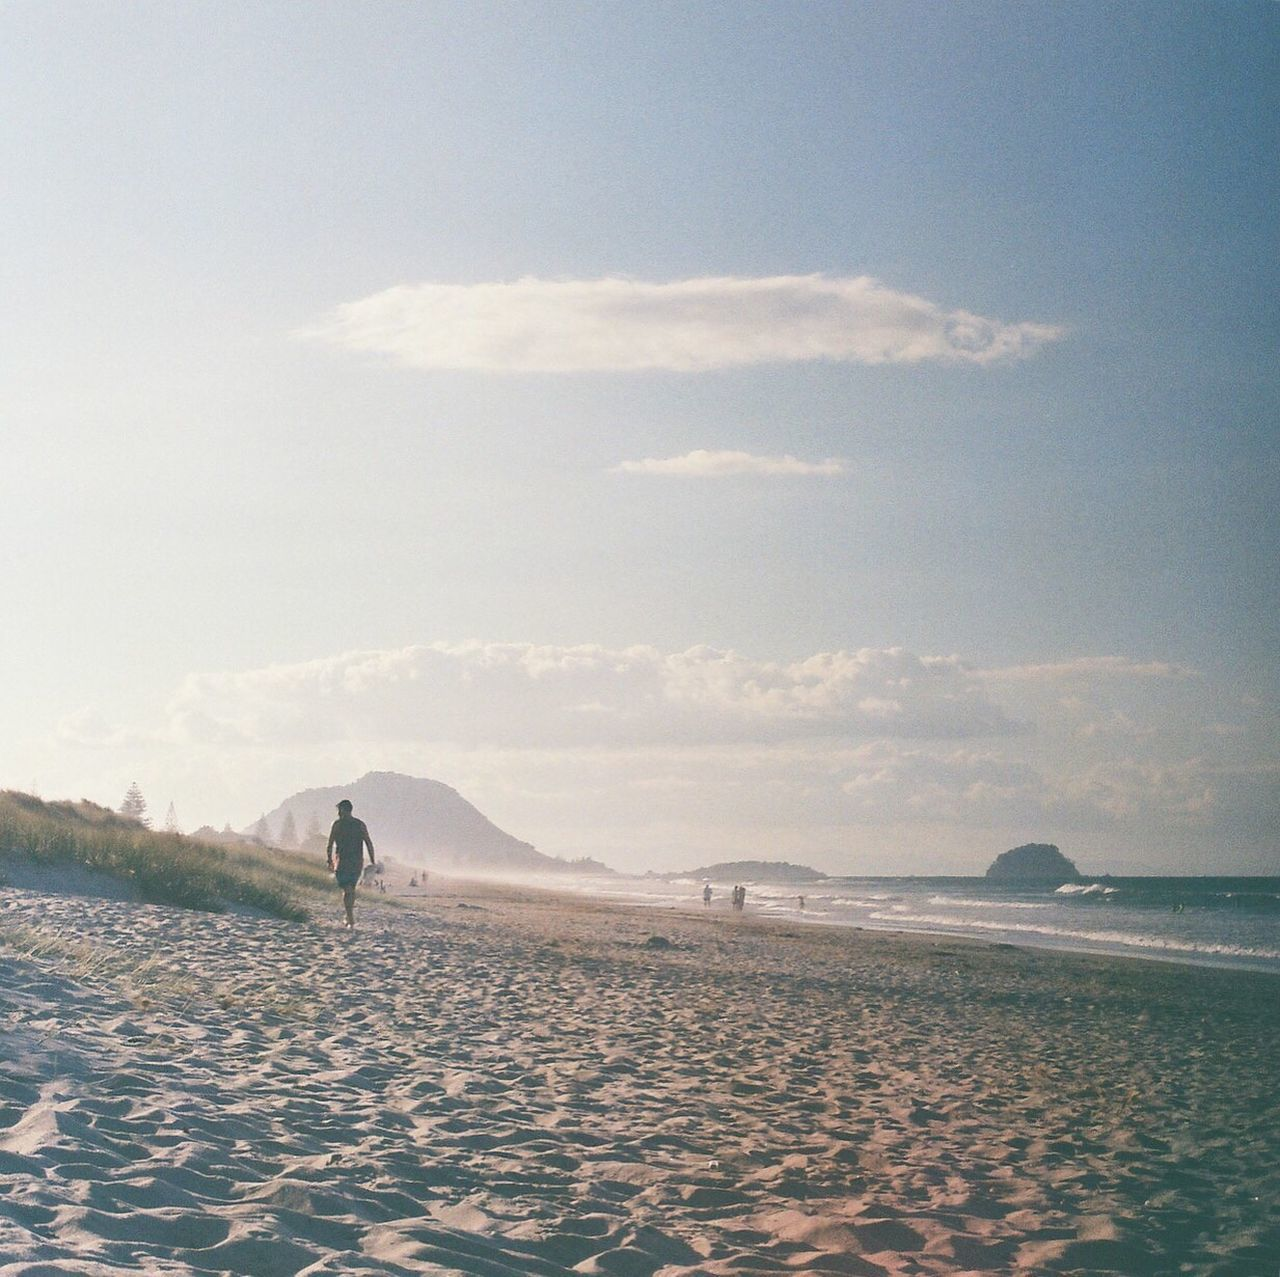 Papamoa Beach Tauranga Papamoa Beach NZ Sea Water Beach Sand Scenics Fujifilm Superiaxtra400 Olympus Om10 Film Photography